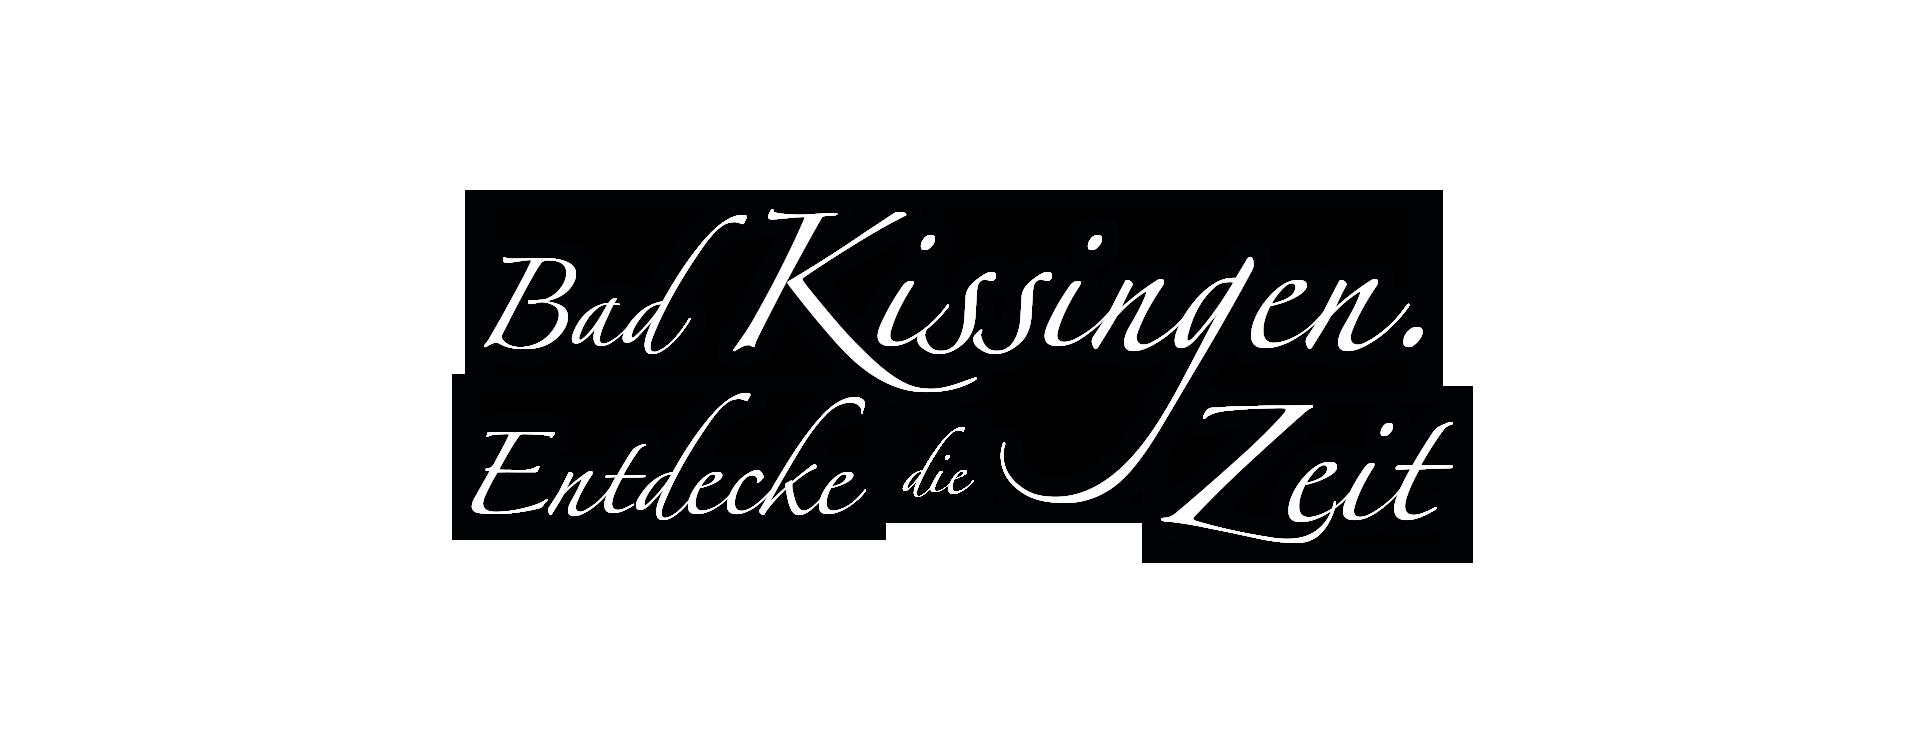 Claim Bad Kissingen 1